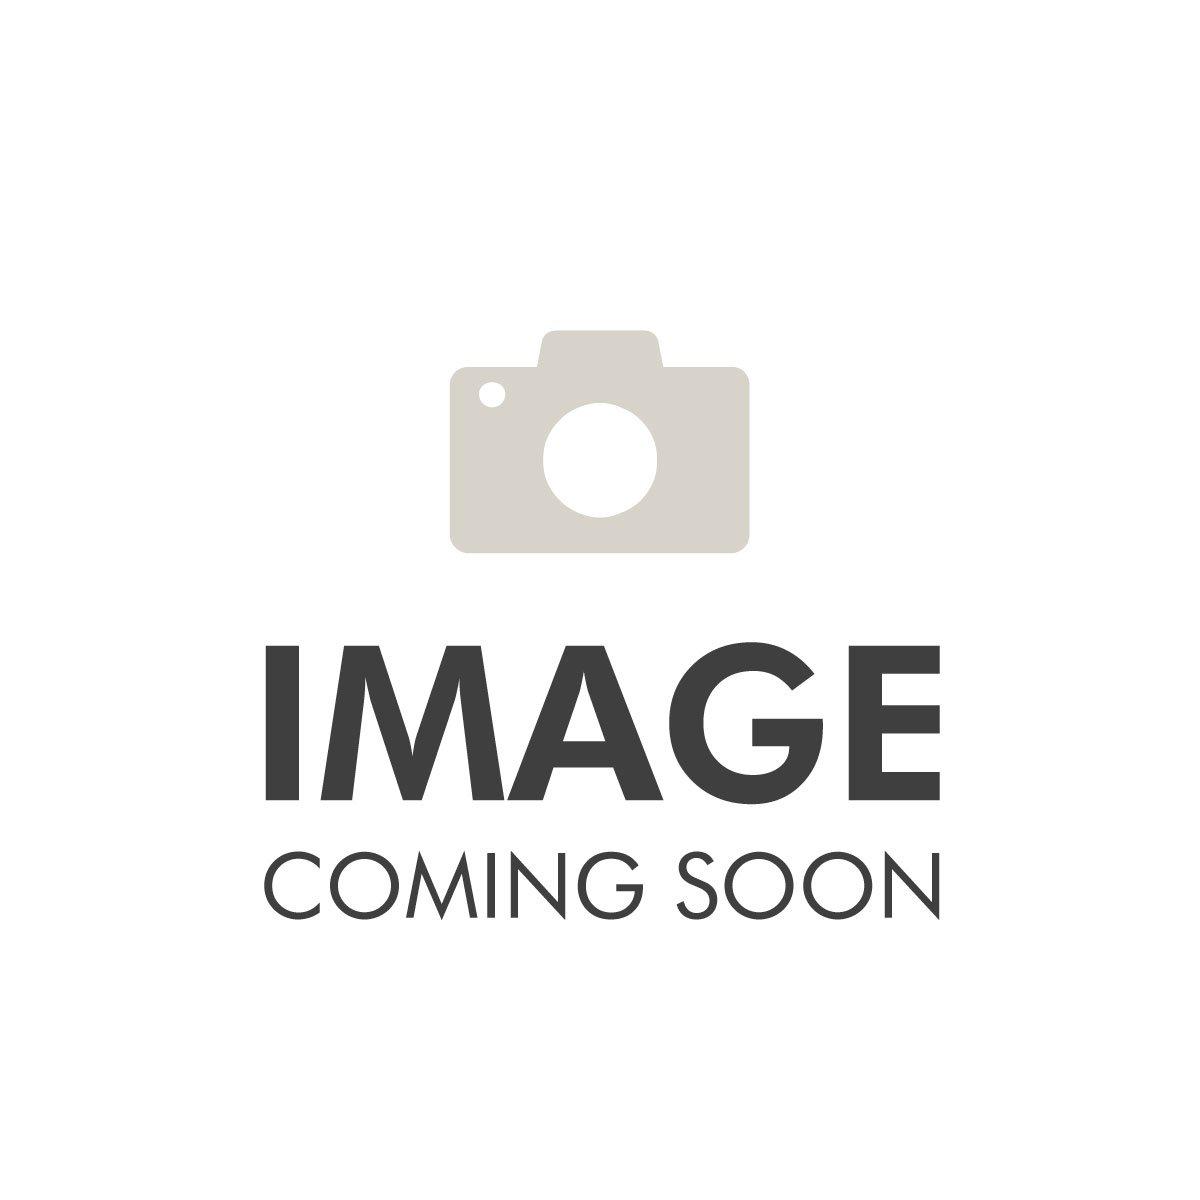 Estee Lauder E/L Dw Sheer Tint Release 50mlanti Oxidant